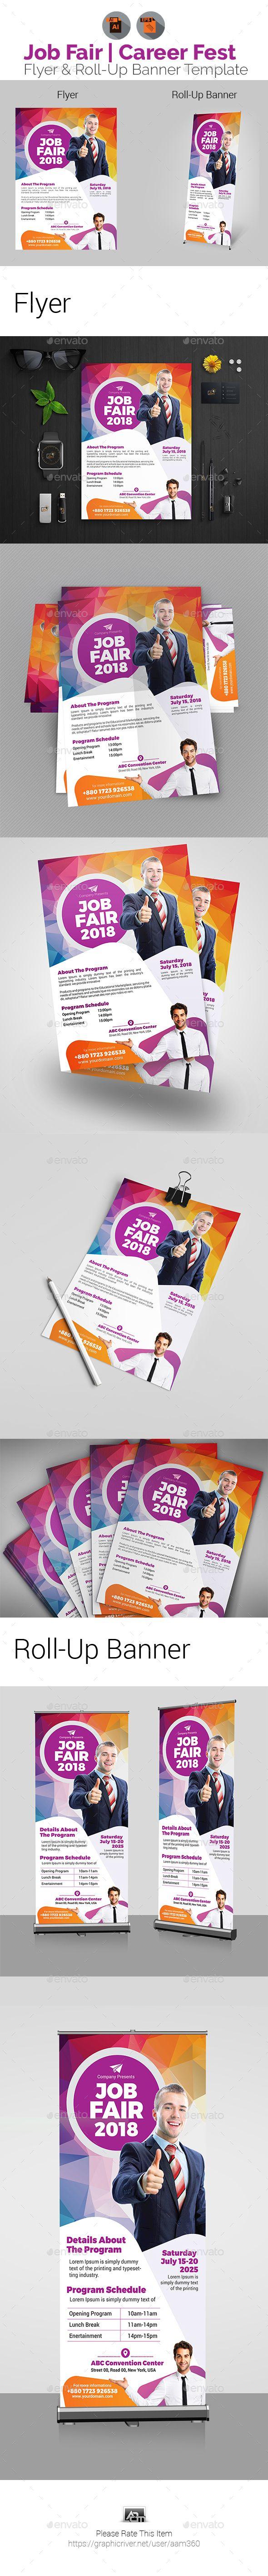 pin by patrick alvarez on sketch pinterest job fair flyer template and event flyer templates